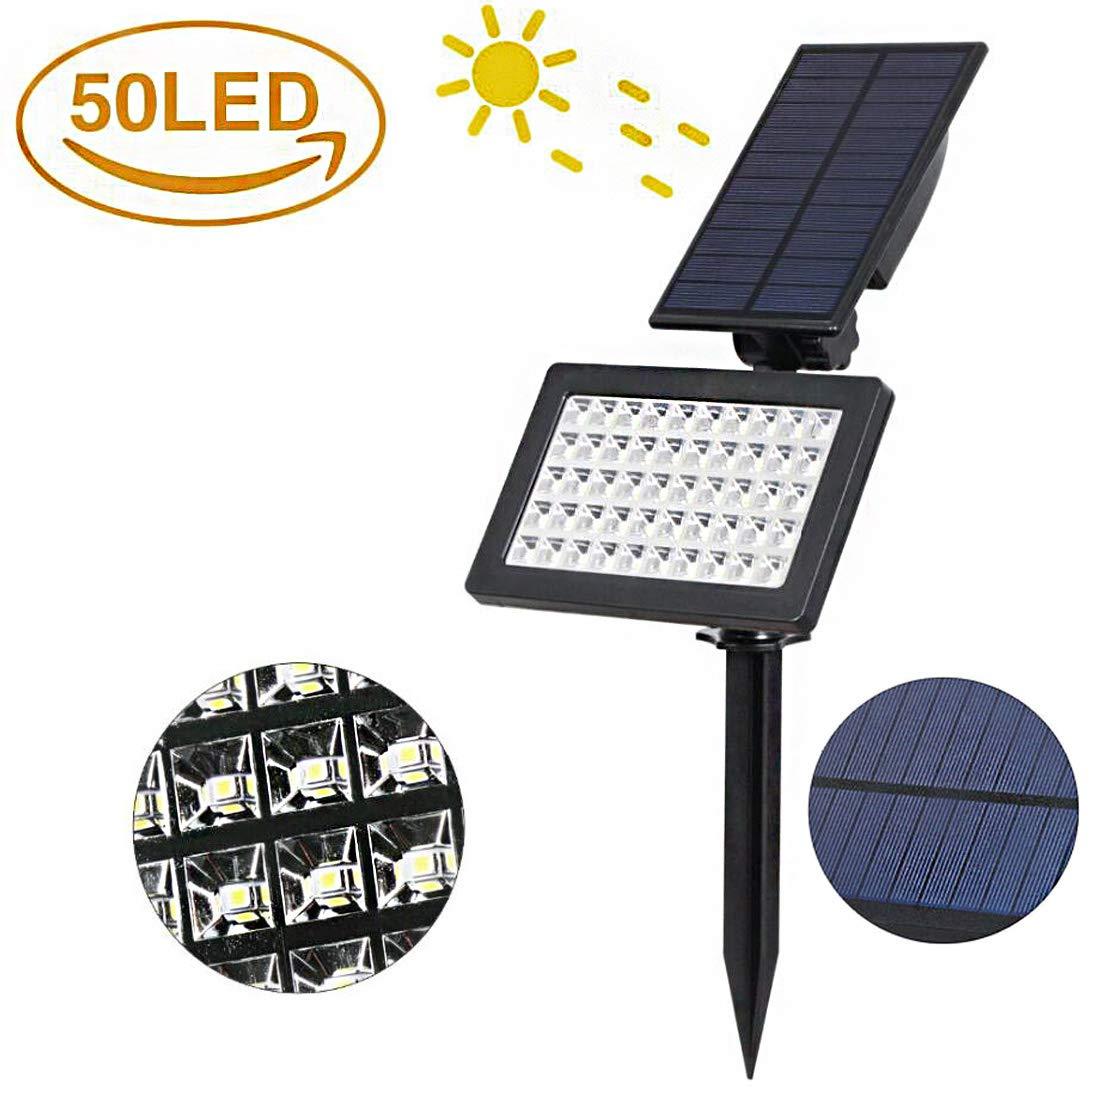 Solar lampioni Luce Esterna Plug in Lampada da Parete Notte Luce Giardino LED Prato Luce Paesaggio luci Giardino luci automaticamente Aperto spento